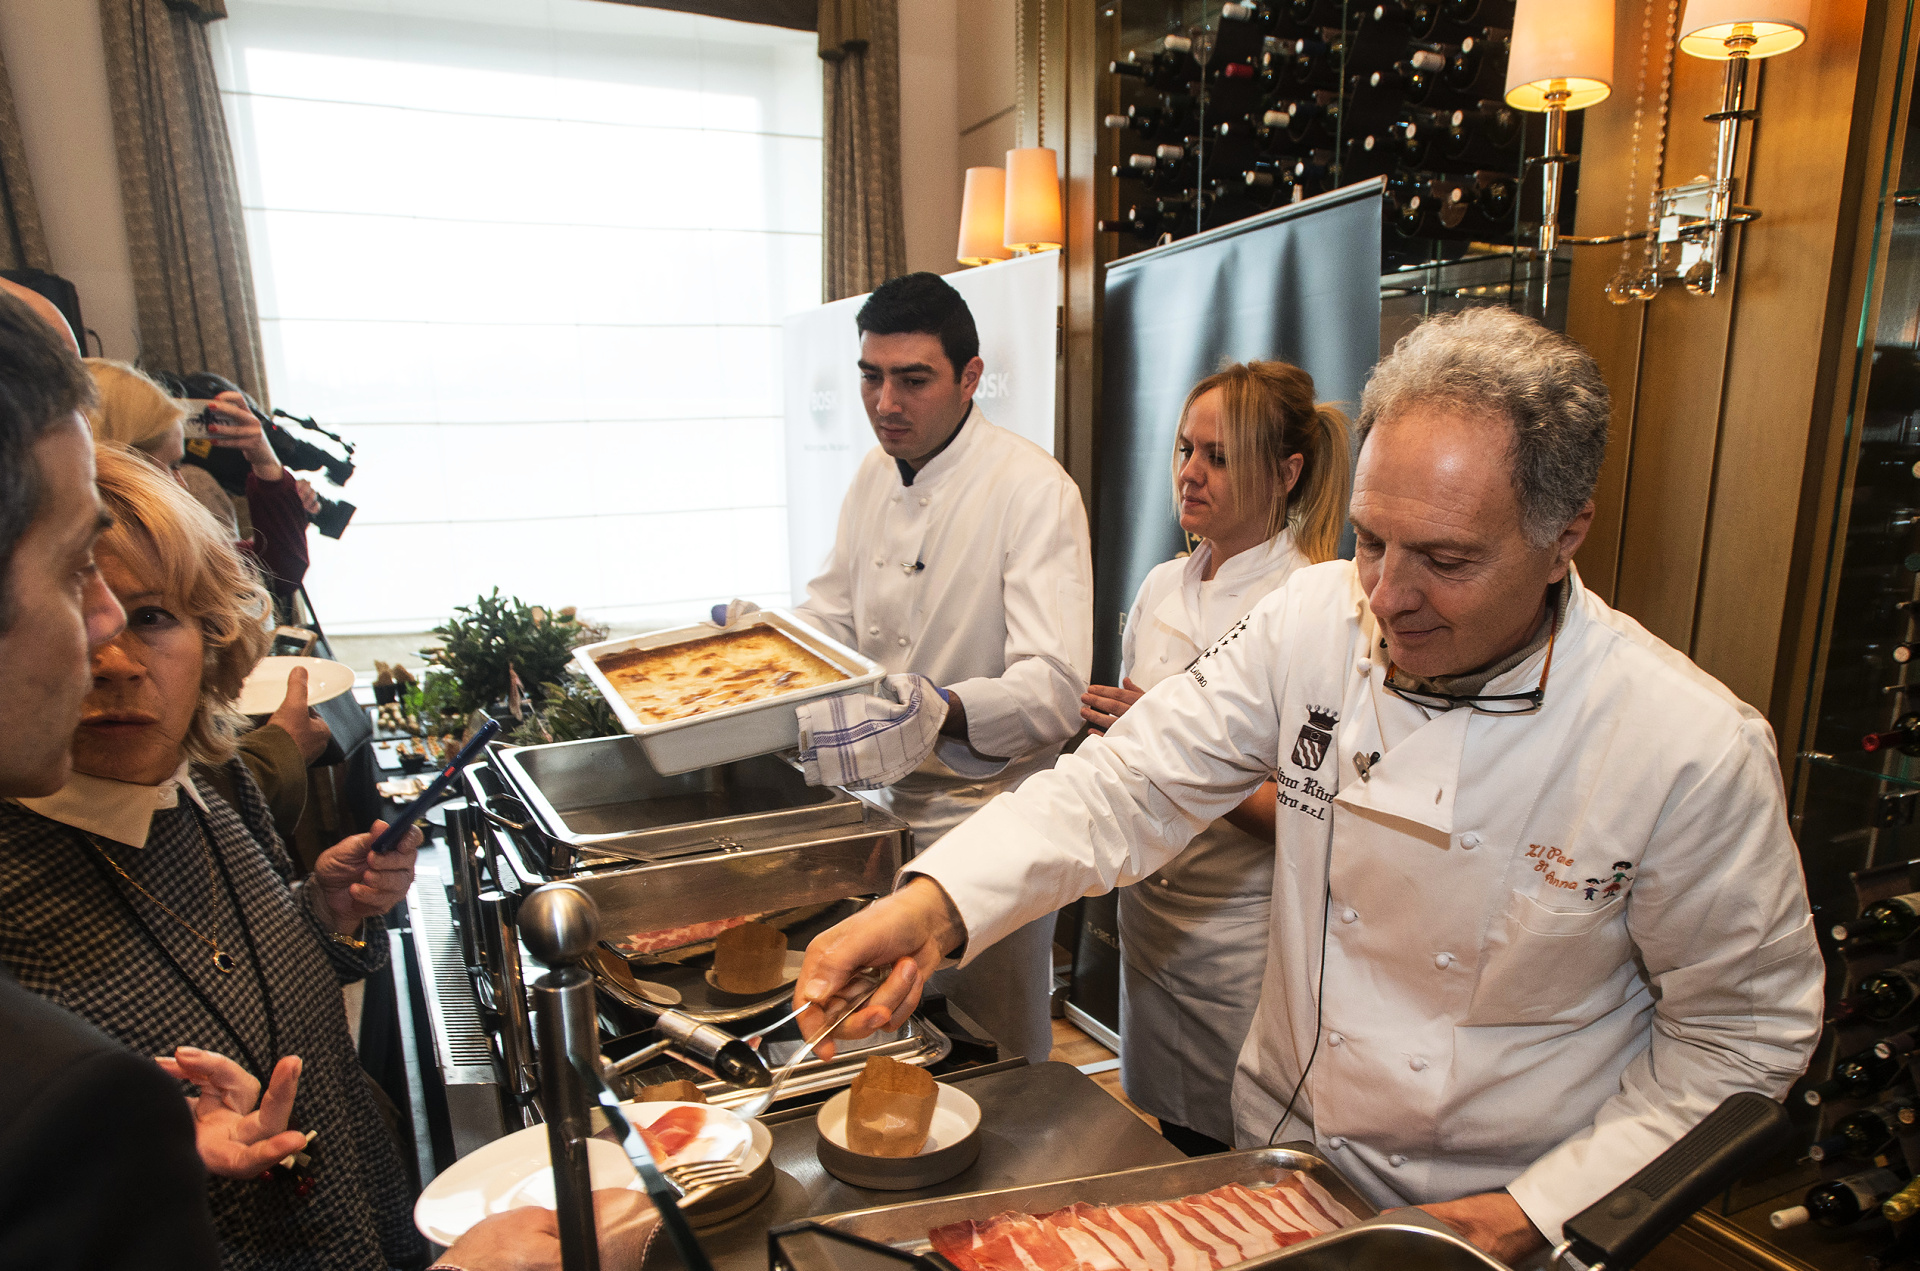 Bosk - Esplanade gluten free cerfitikat_ Ana Grgić, chef Esplanade, talinanski chef Eugenio Rivetti